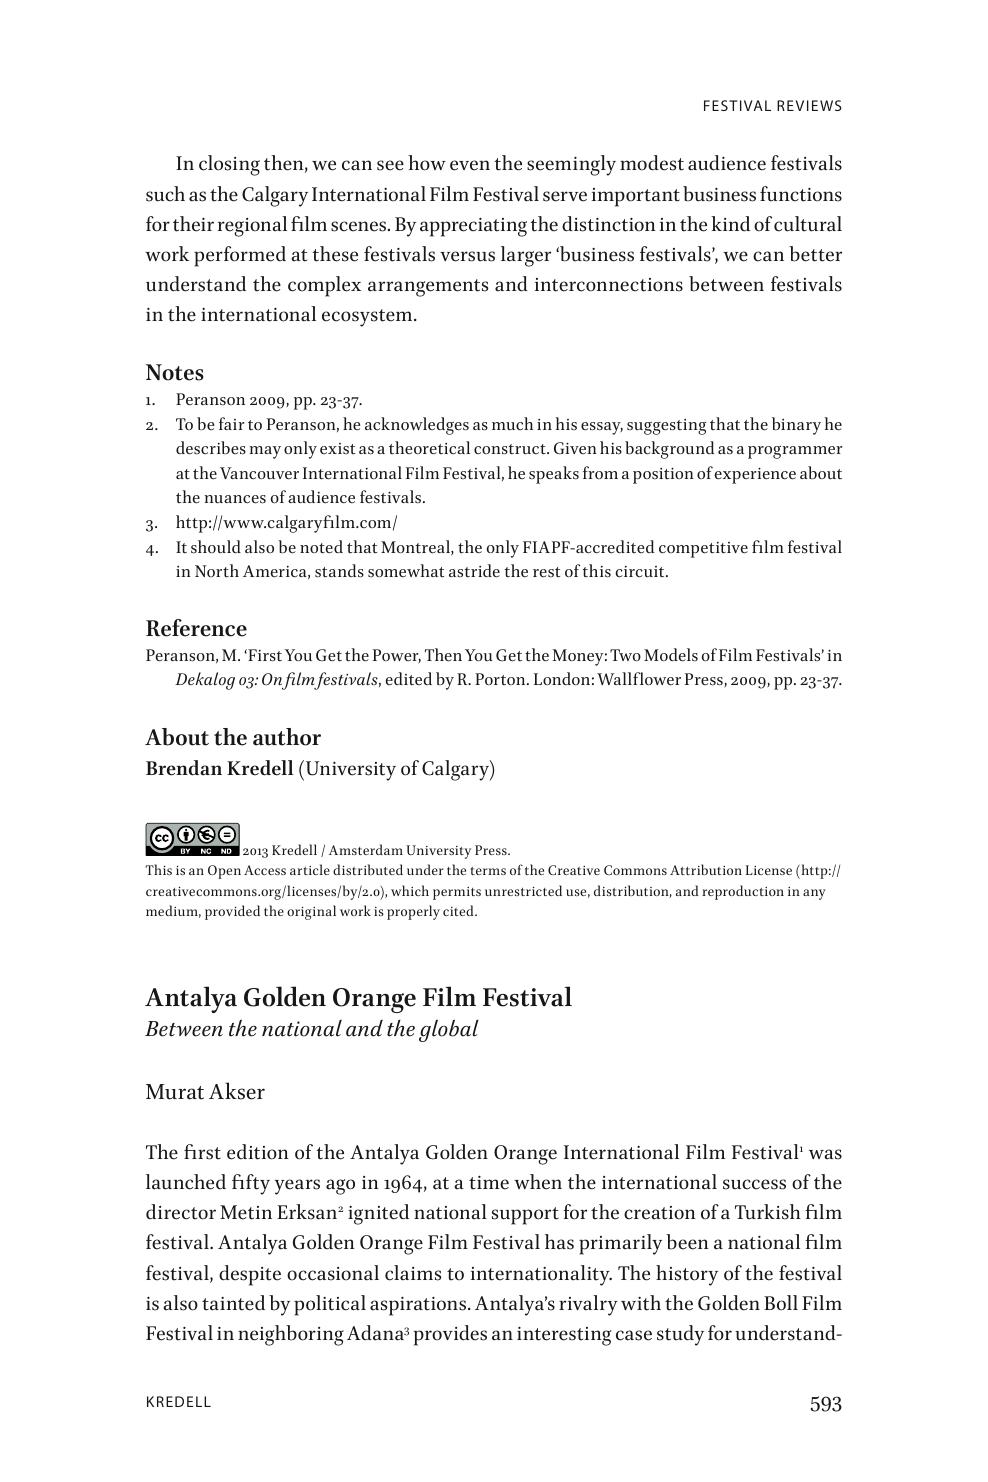 Antalya Golden Orange Film Festival: Between the national